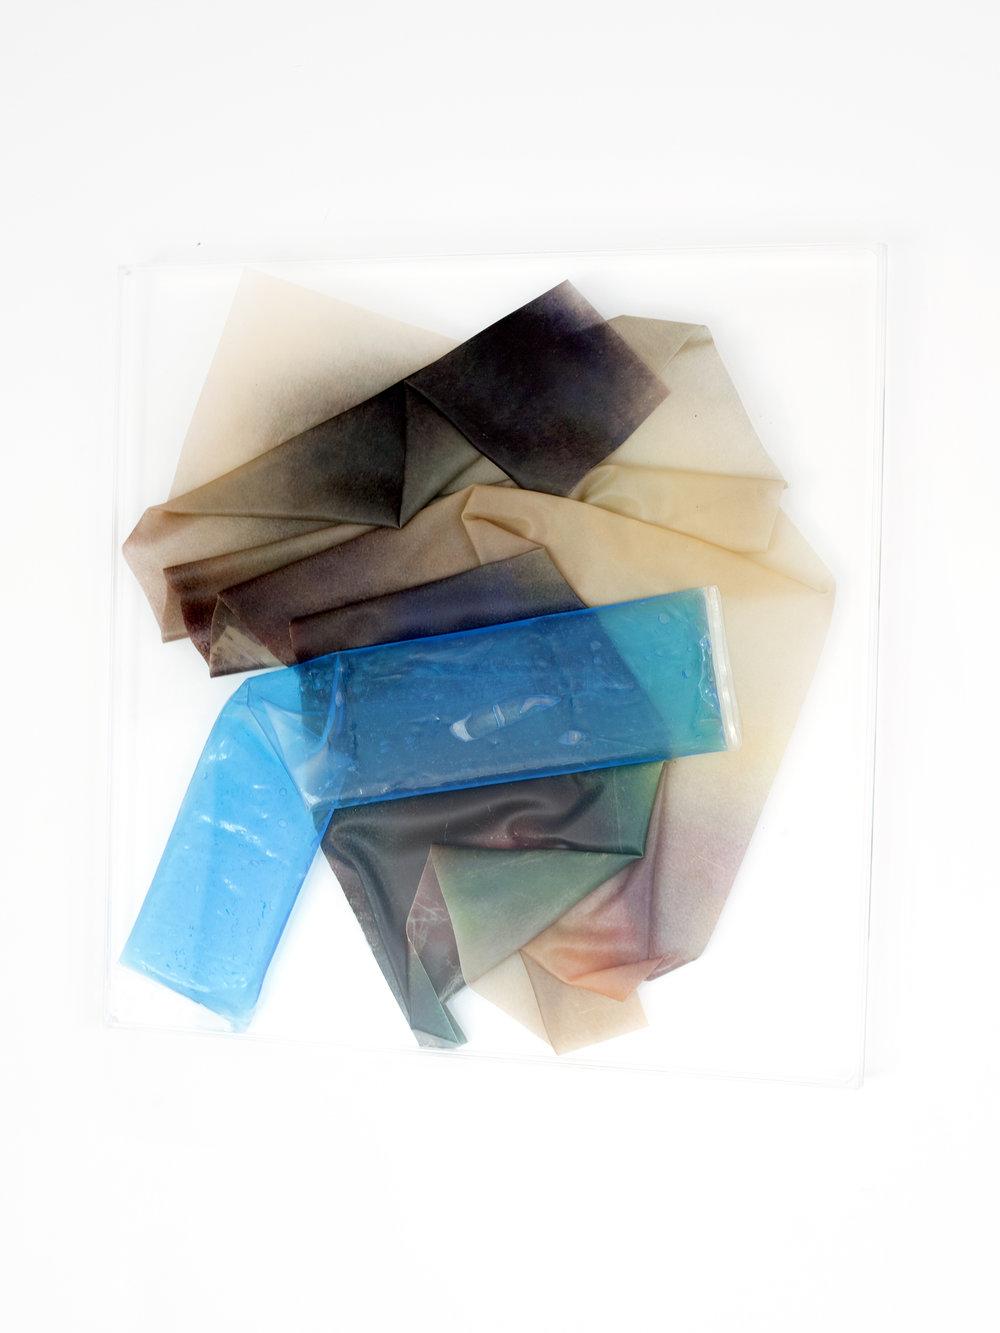 LOW KEY, 2018, sculpture (unique), 48 X 48 X 1,6 cm, inkjetprint on latex, transparent acrylic, gel in plastic